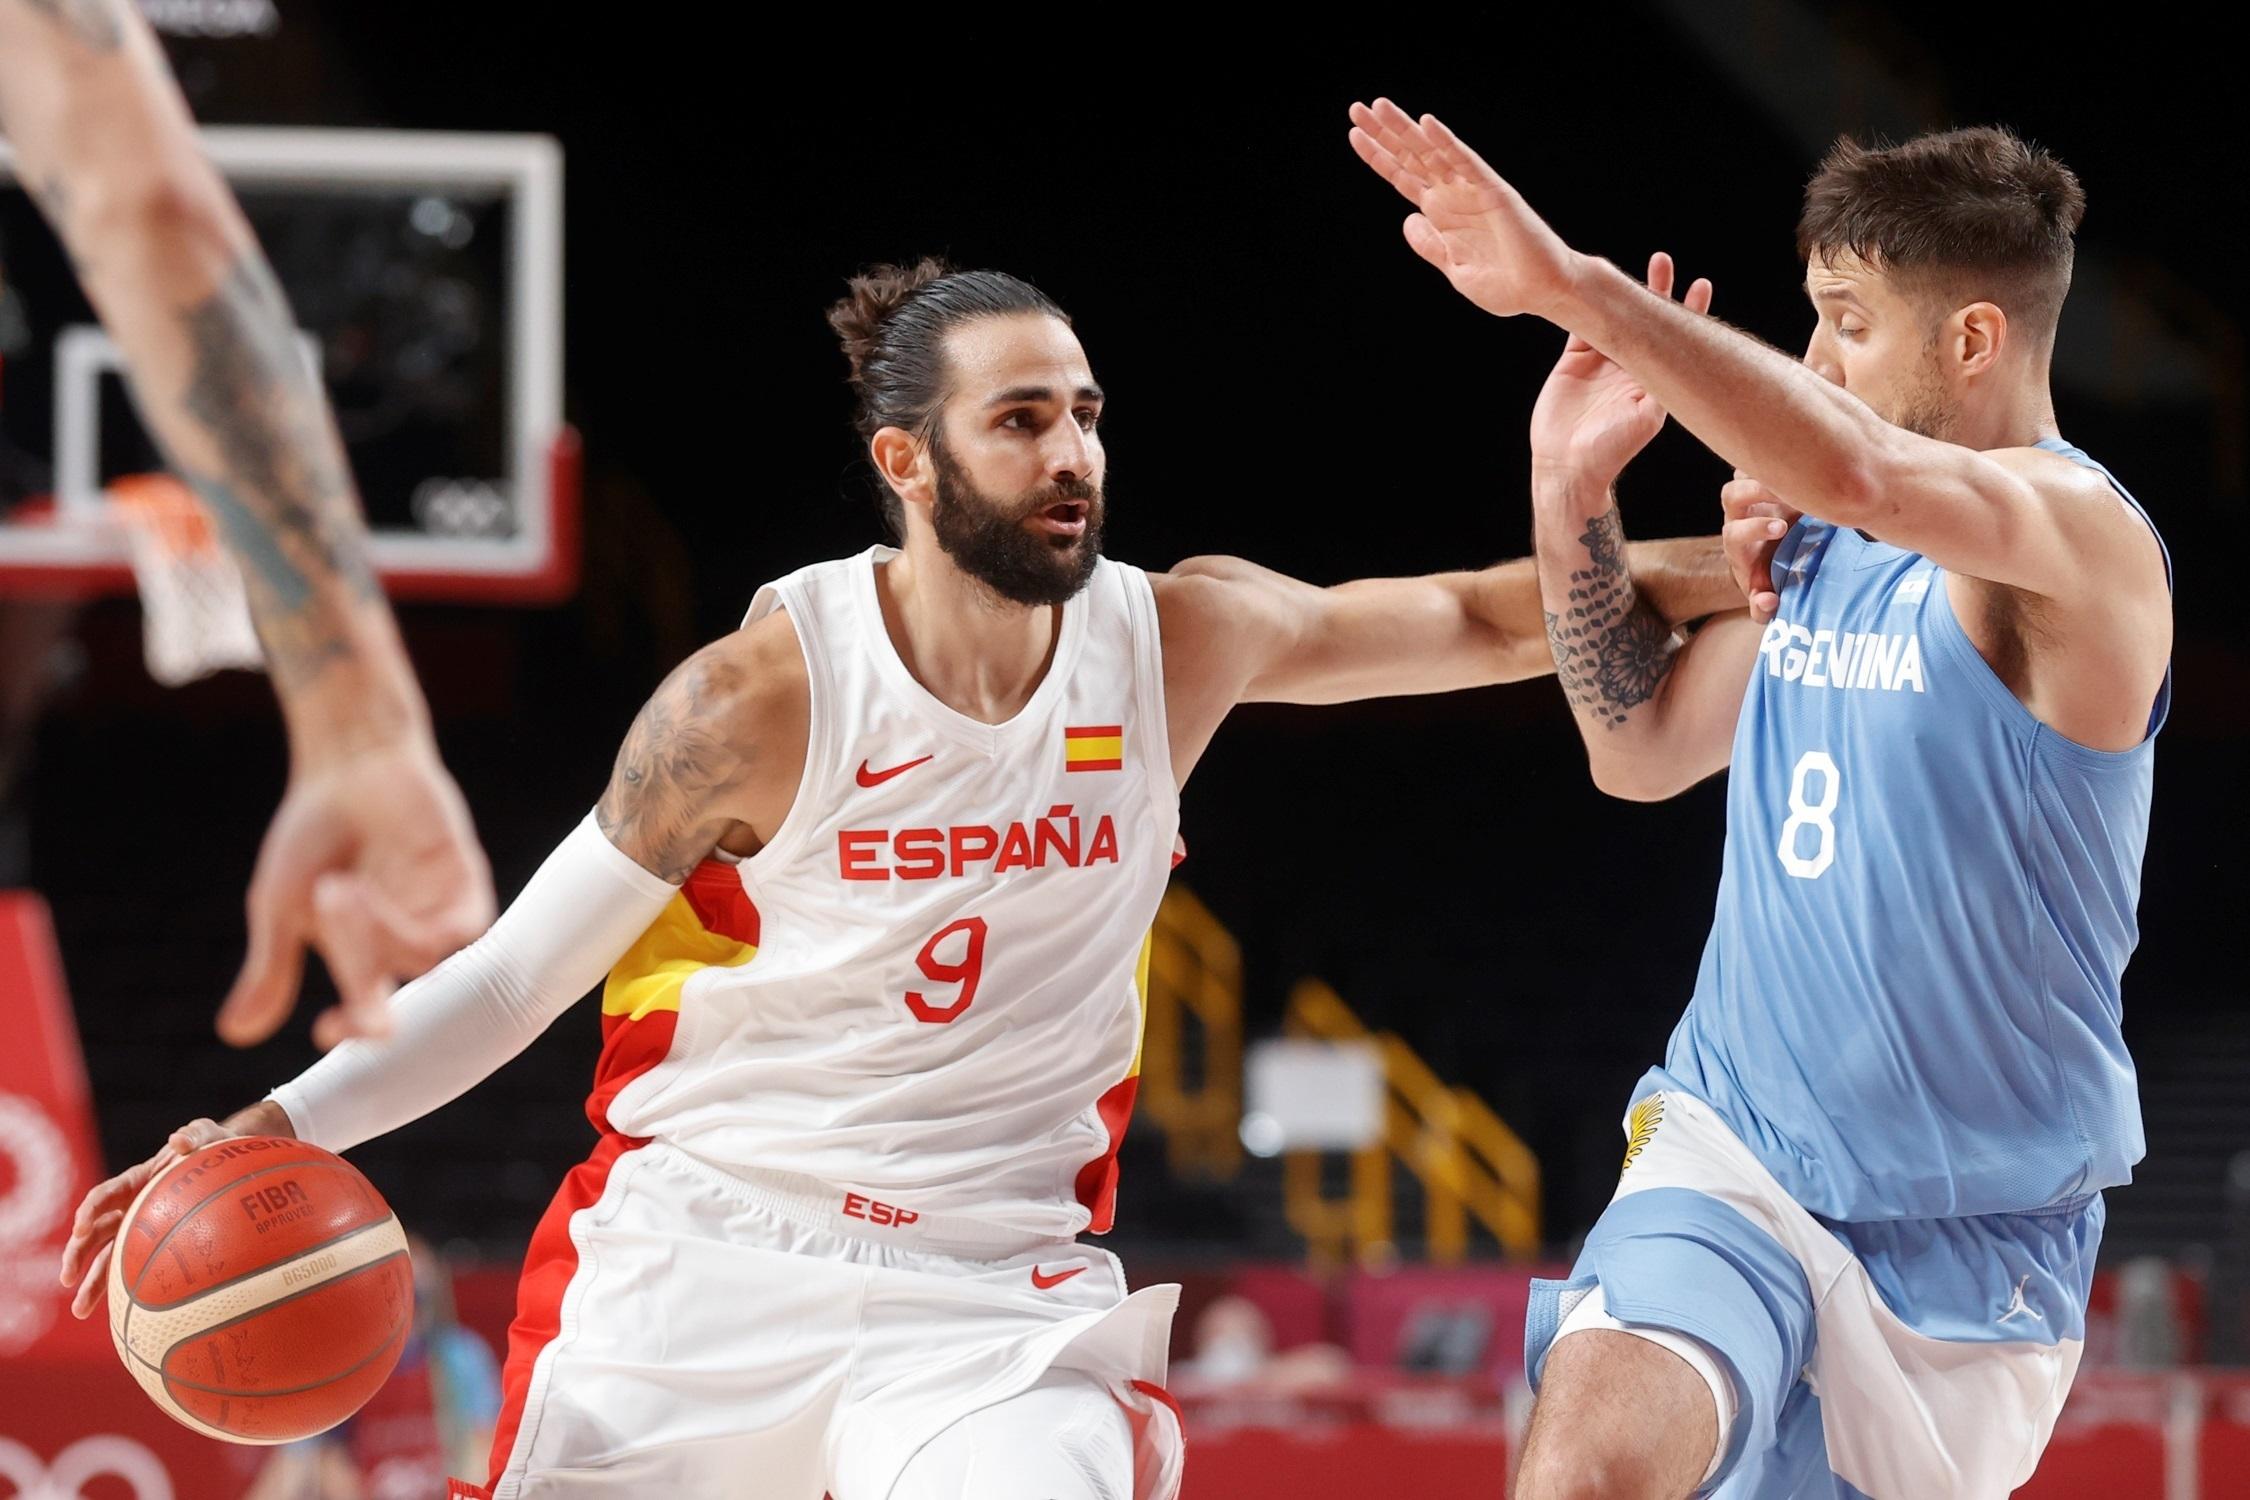 España Argentina - baloncesto - Juegos Olímpicos 2021 - Tokio 2020